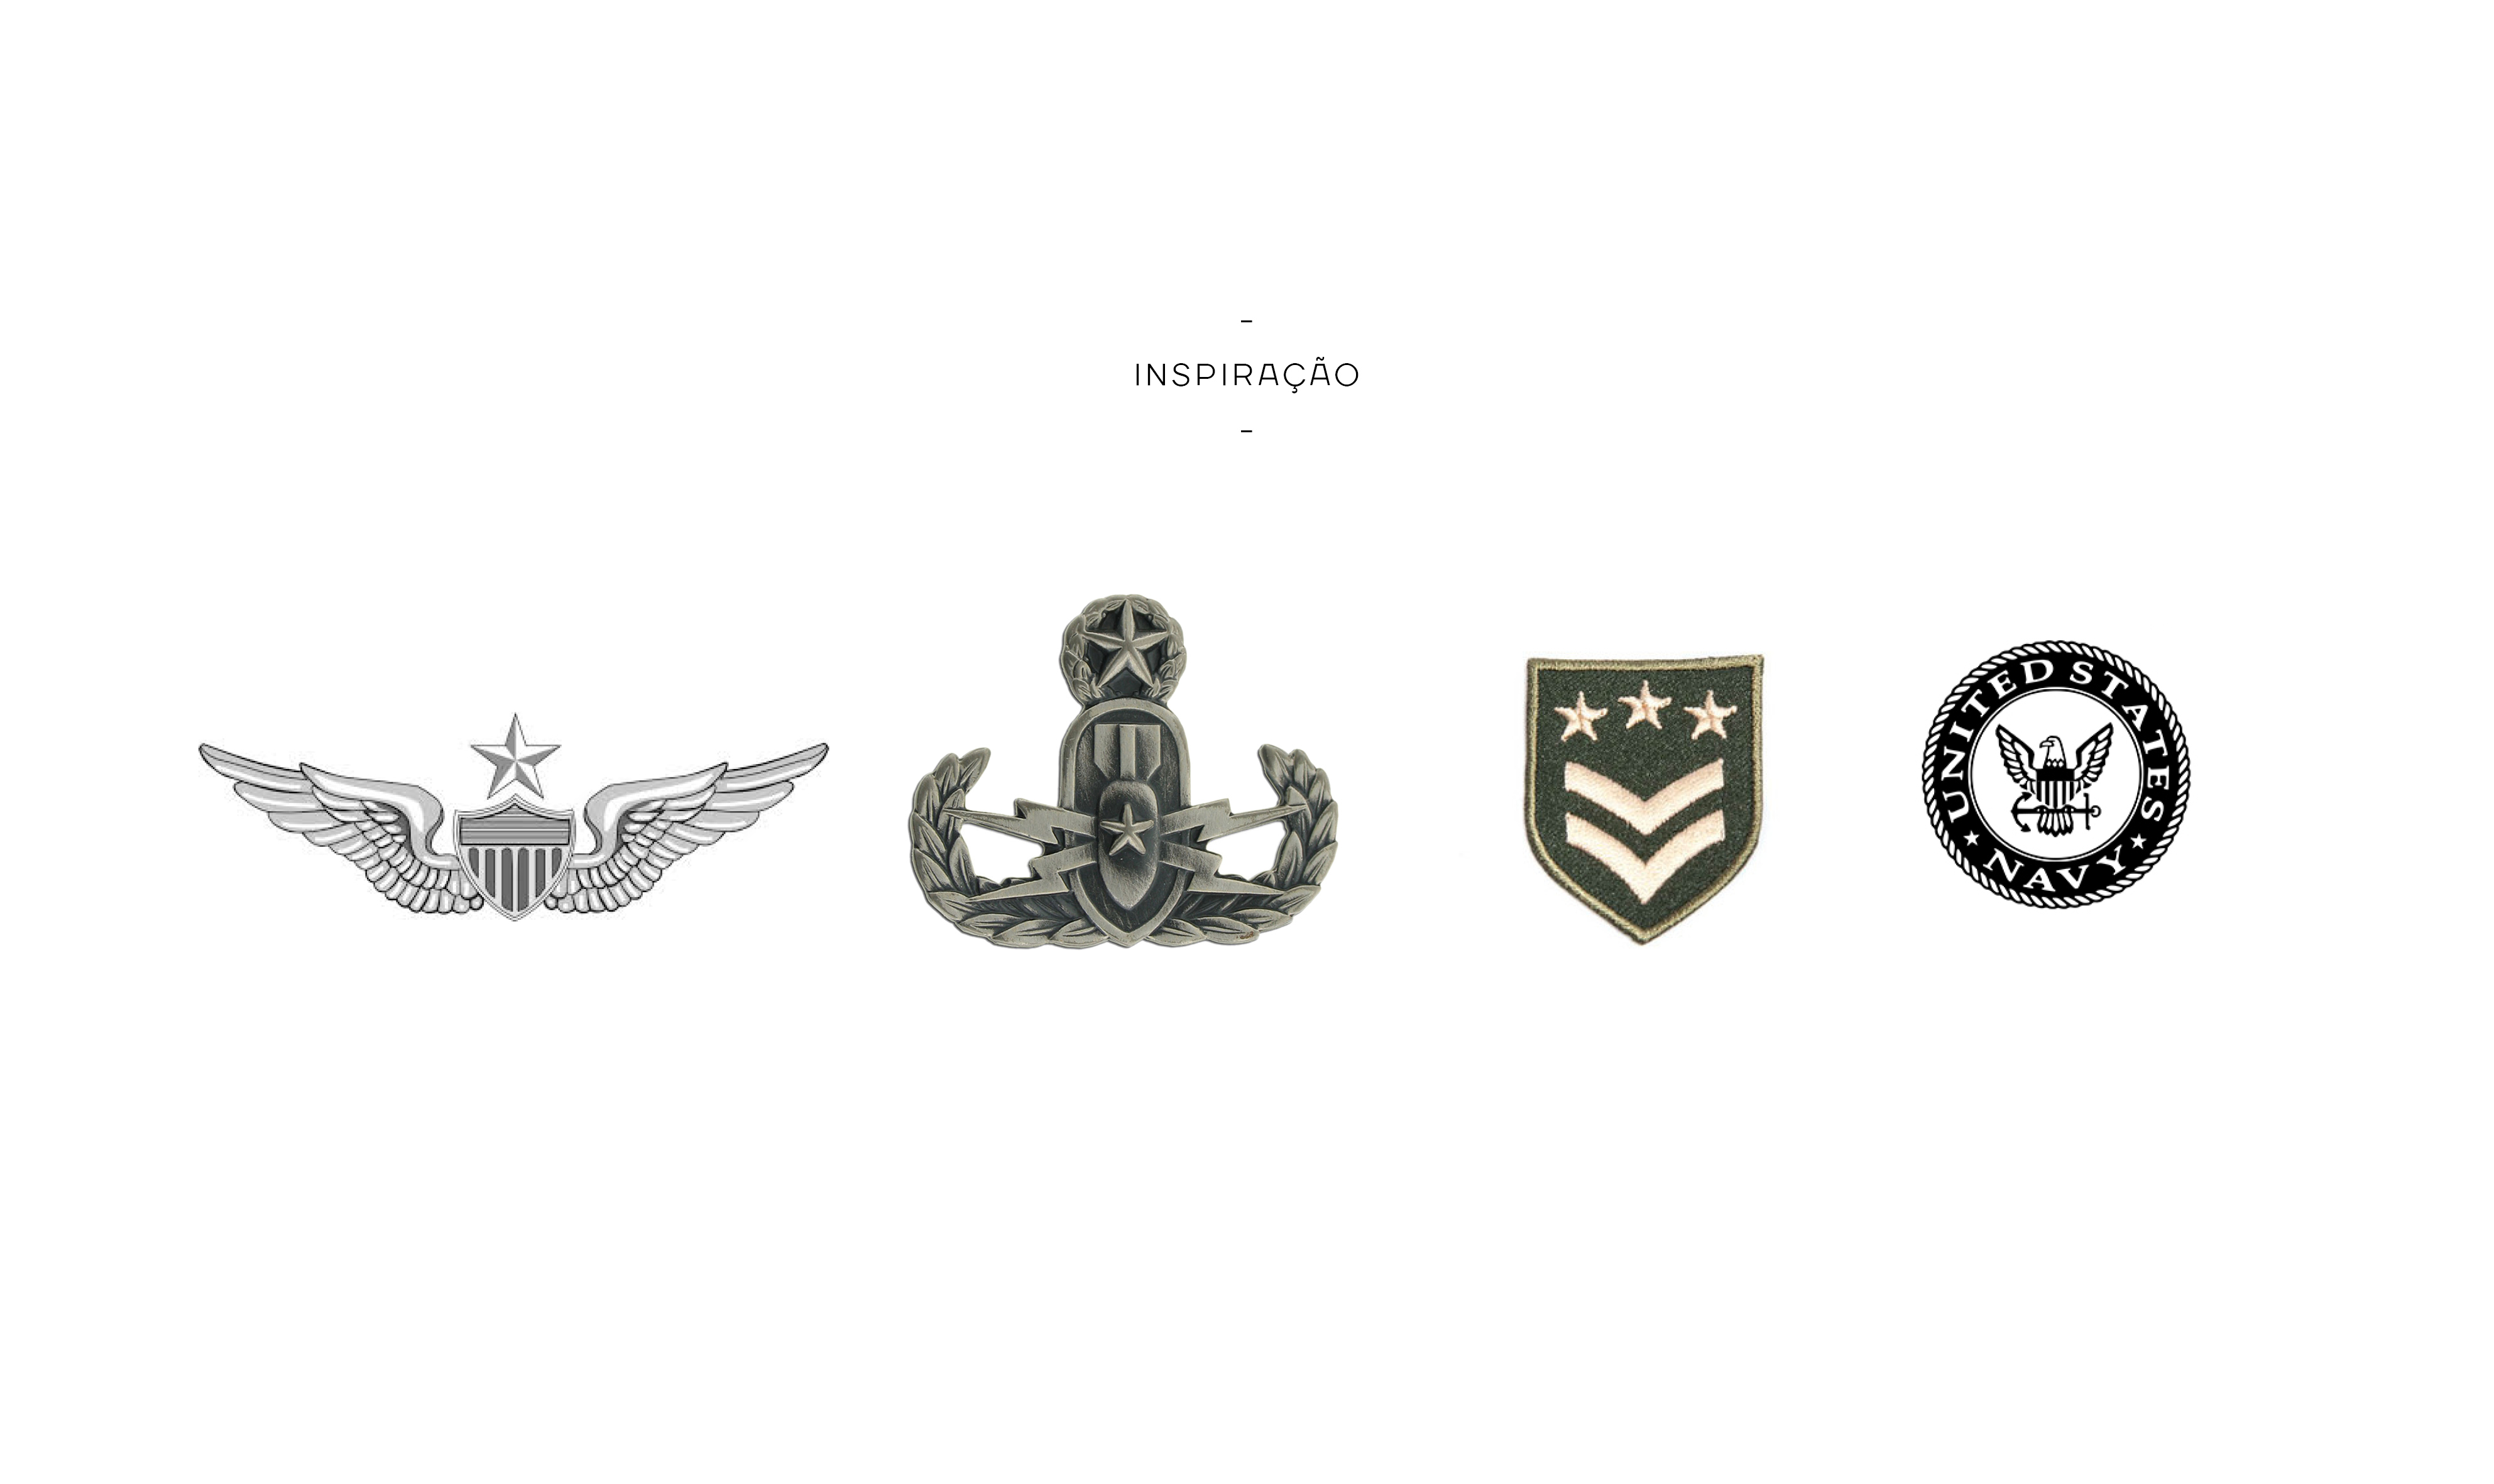 201710 Armada Futebol Americano - Projeto desenvolvido por Nacione6